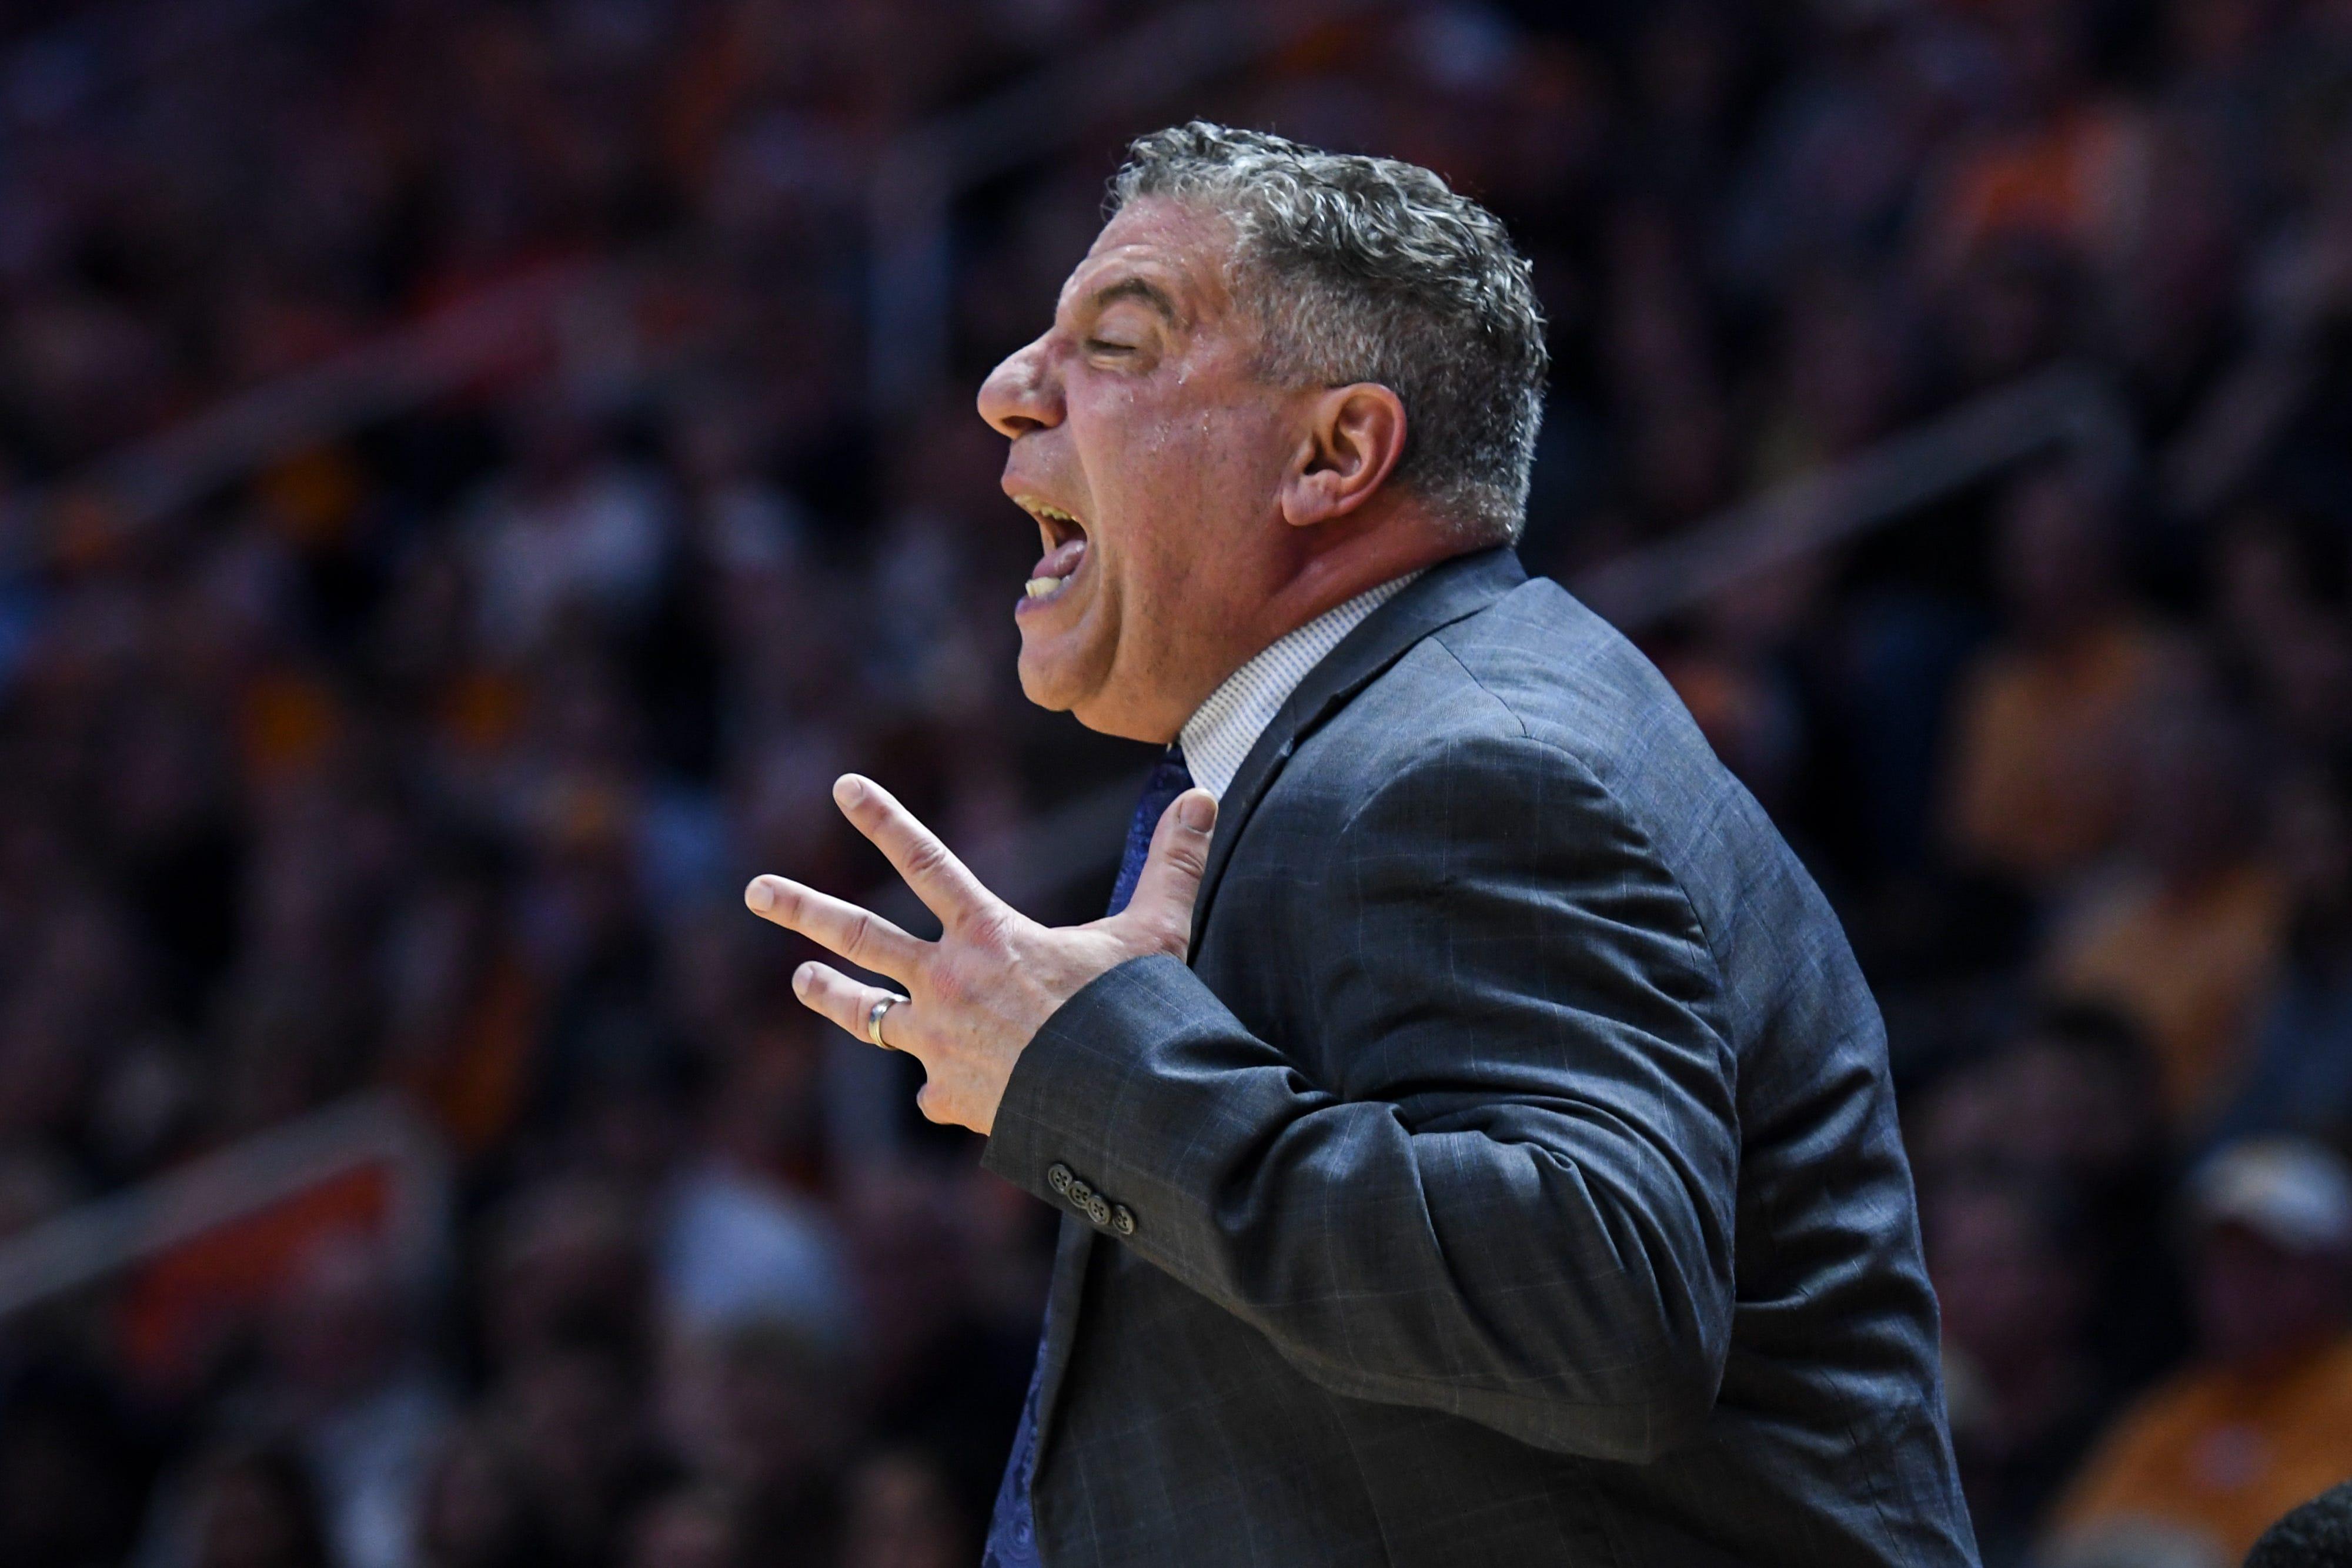 Auburn men's basketball program self-imposing postseason ban for 2020-21 season